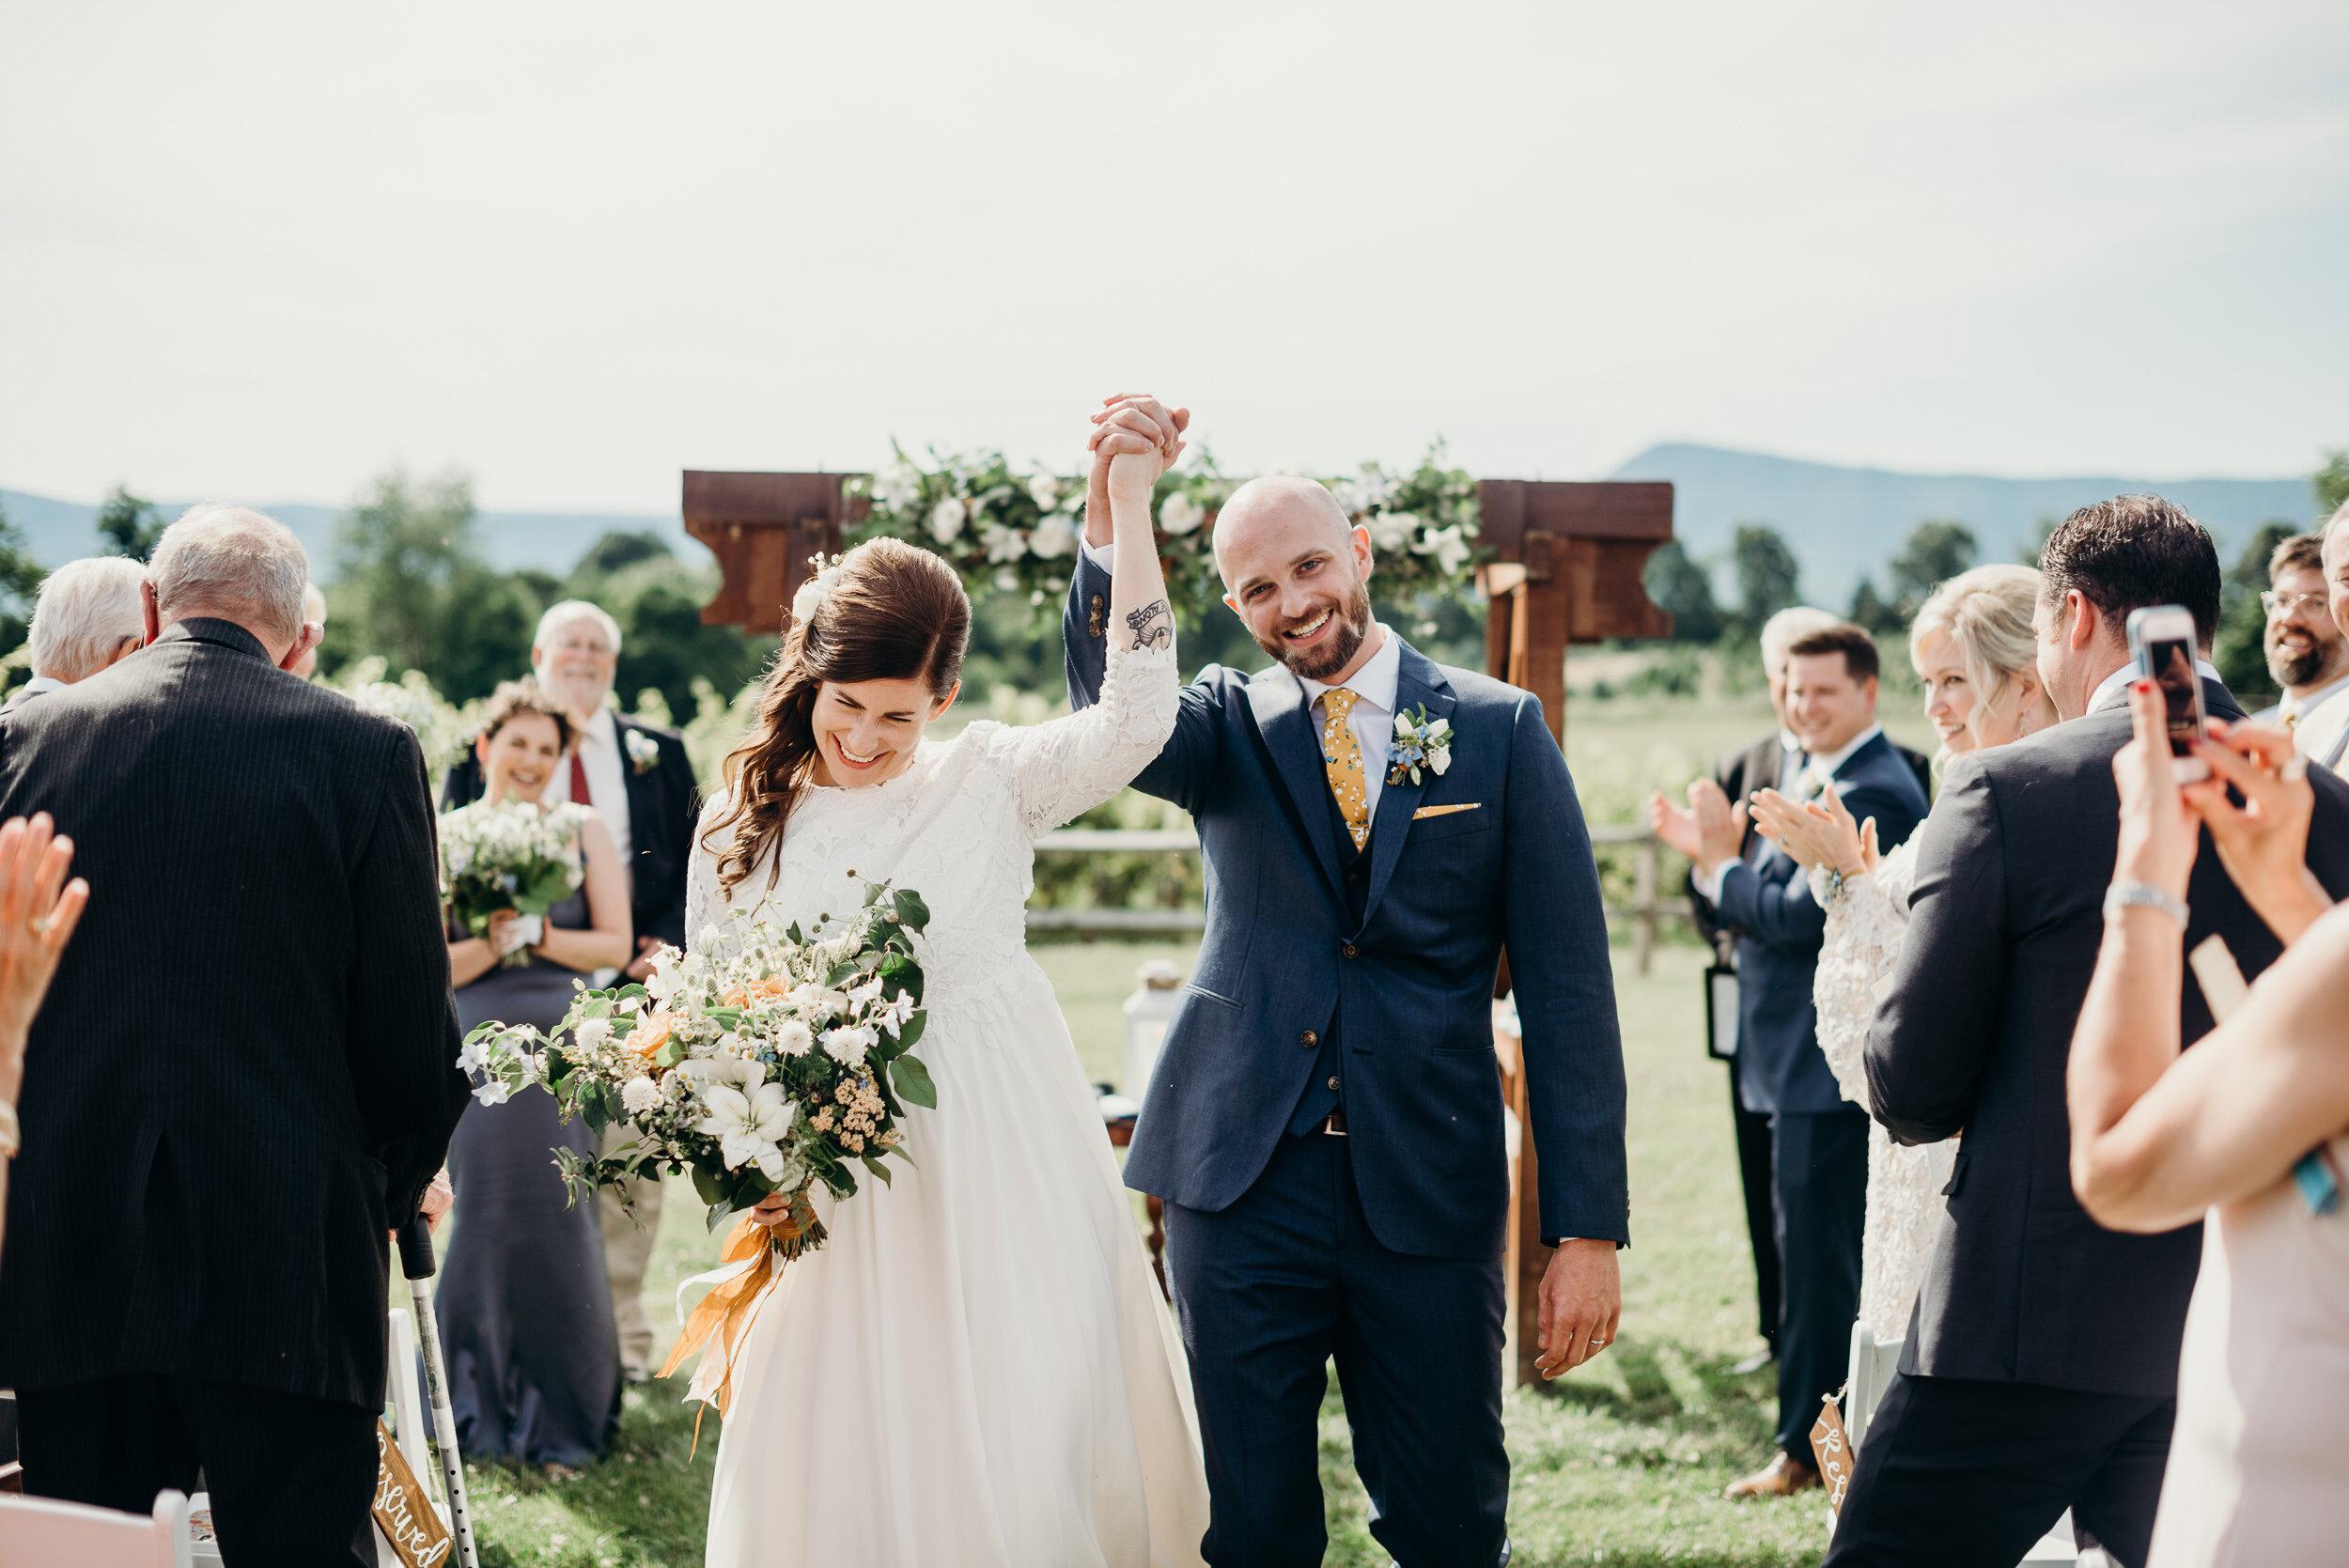 faithbrooke-barn-vineyard-wedding-photo-mustard-yellow-navy-motorcycle-MMG_8902.jpg